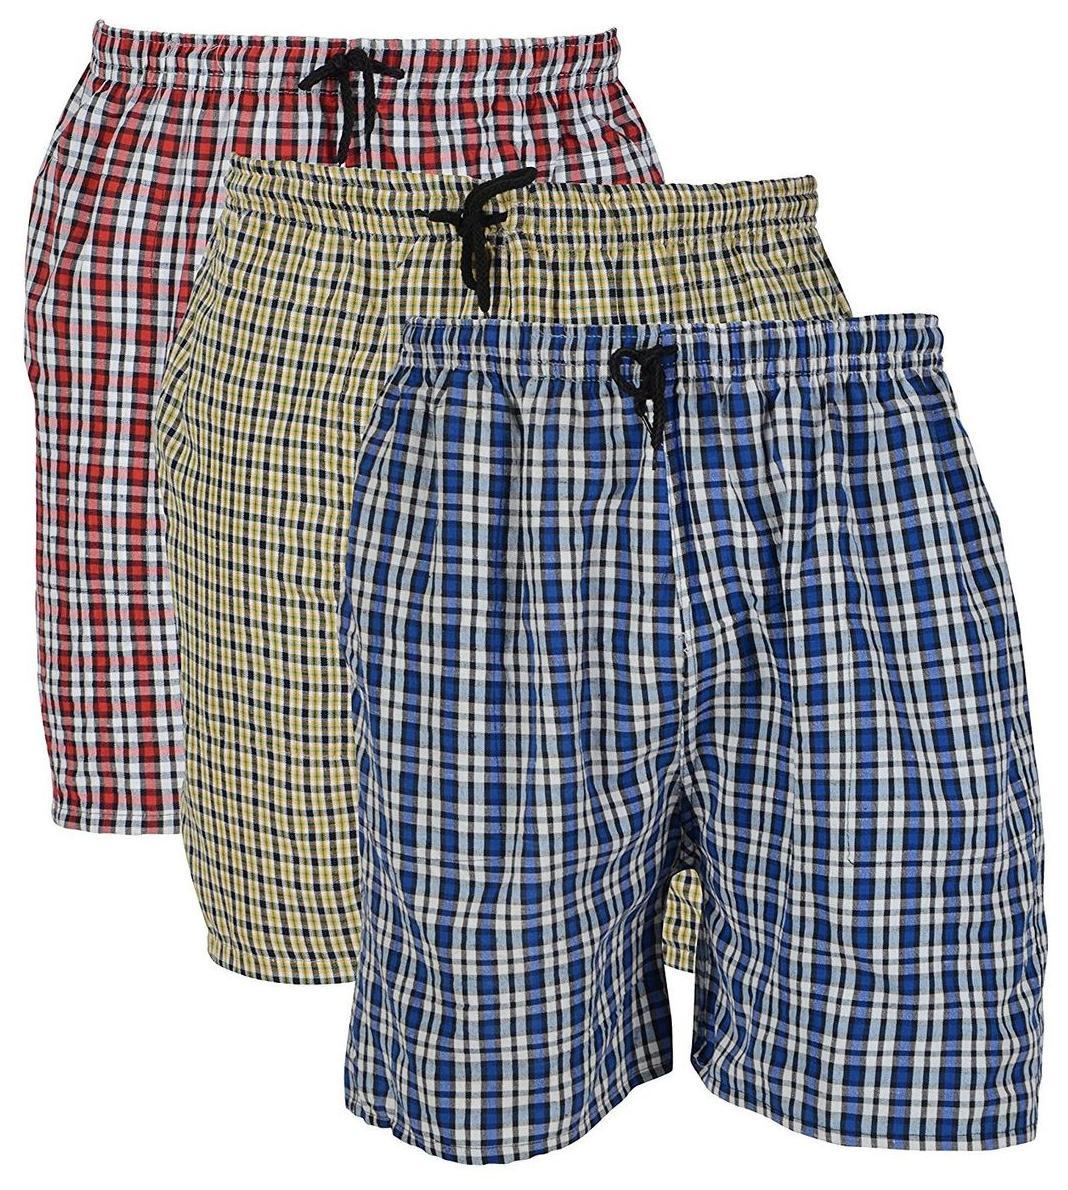 Rebizo mens checkered design shorts (pack of 3)